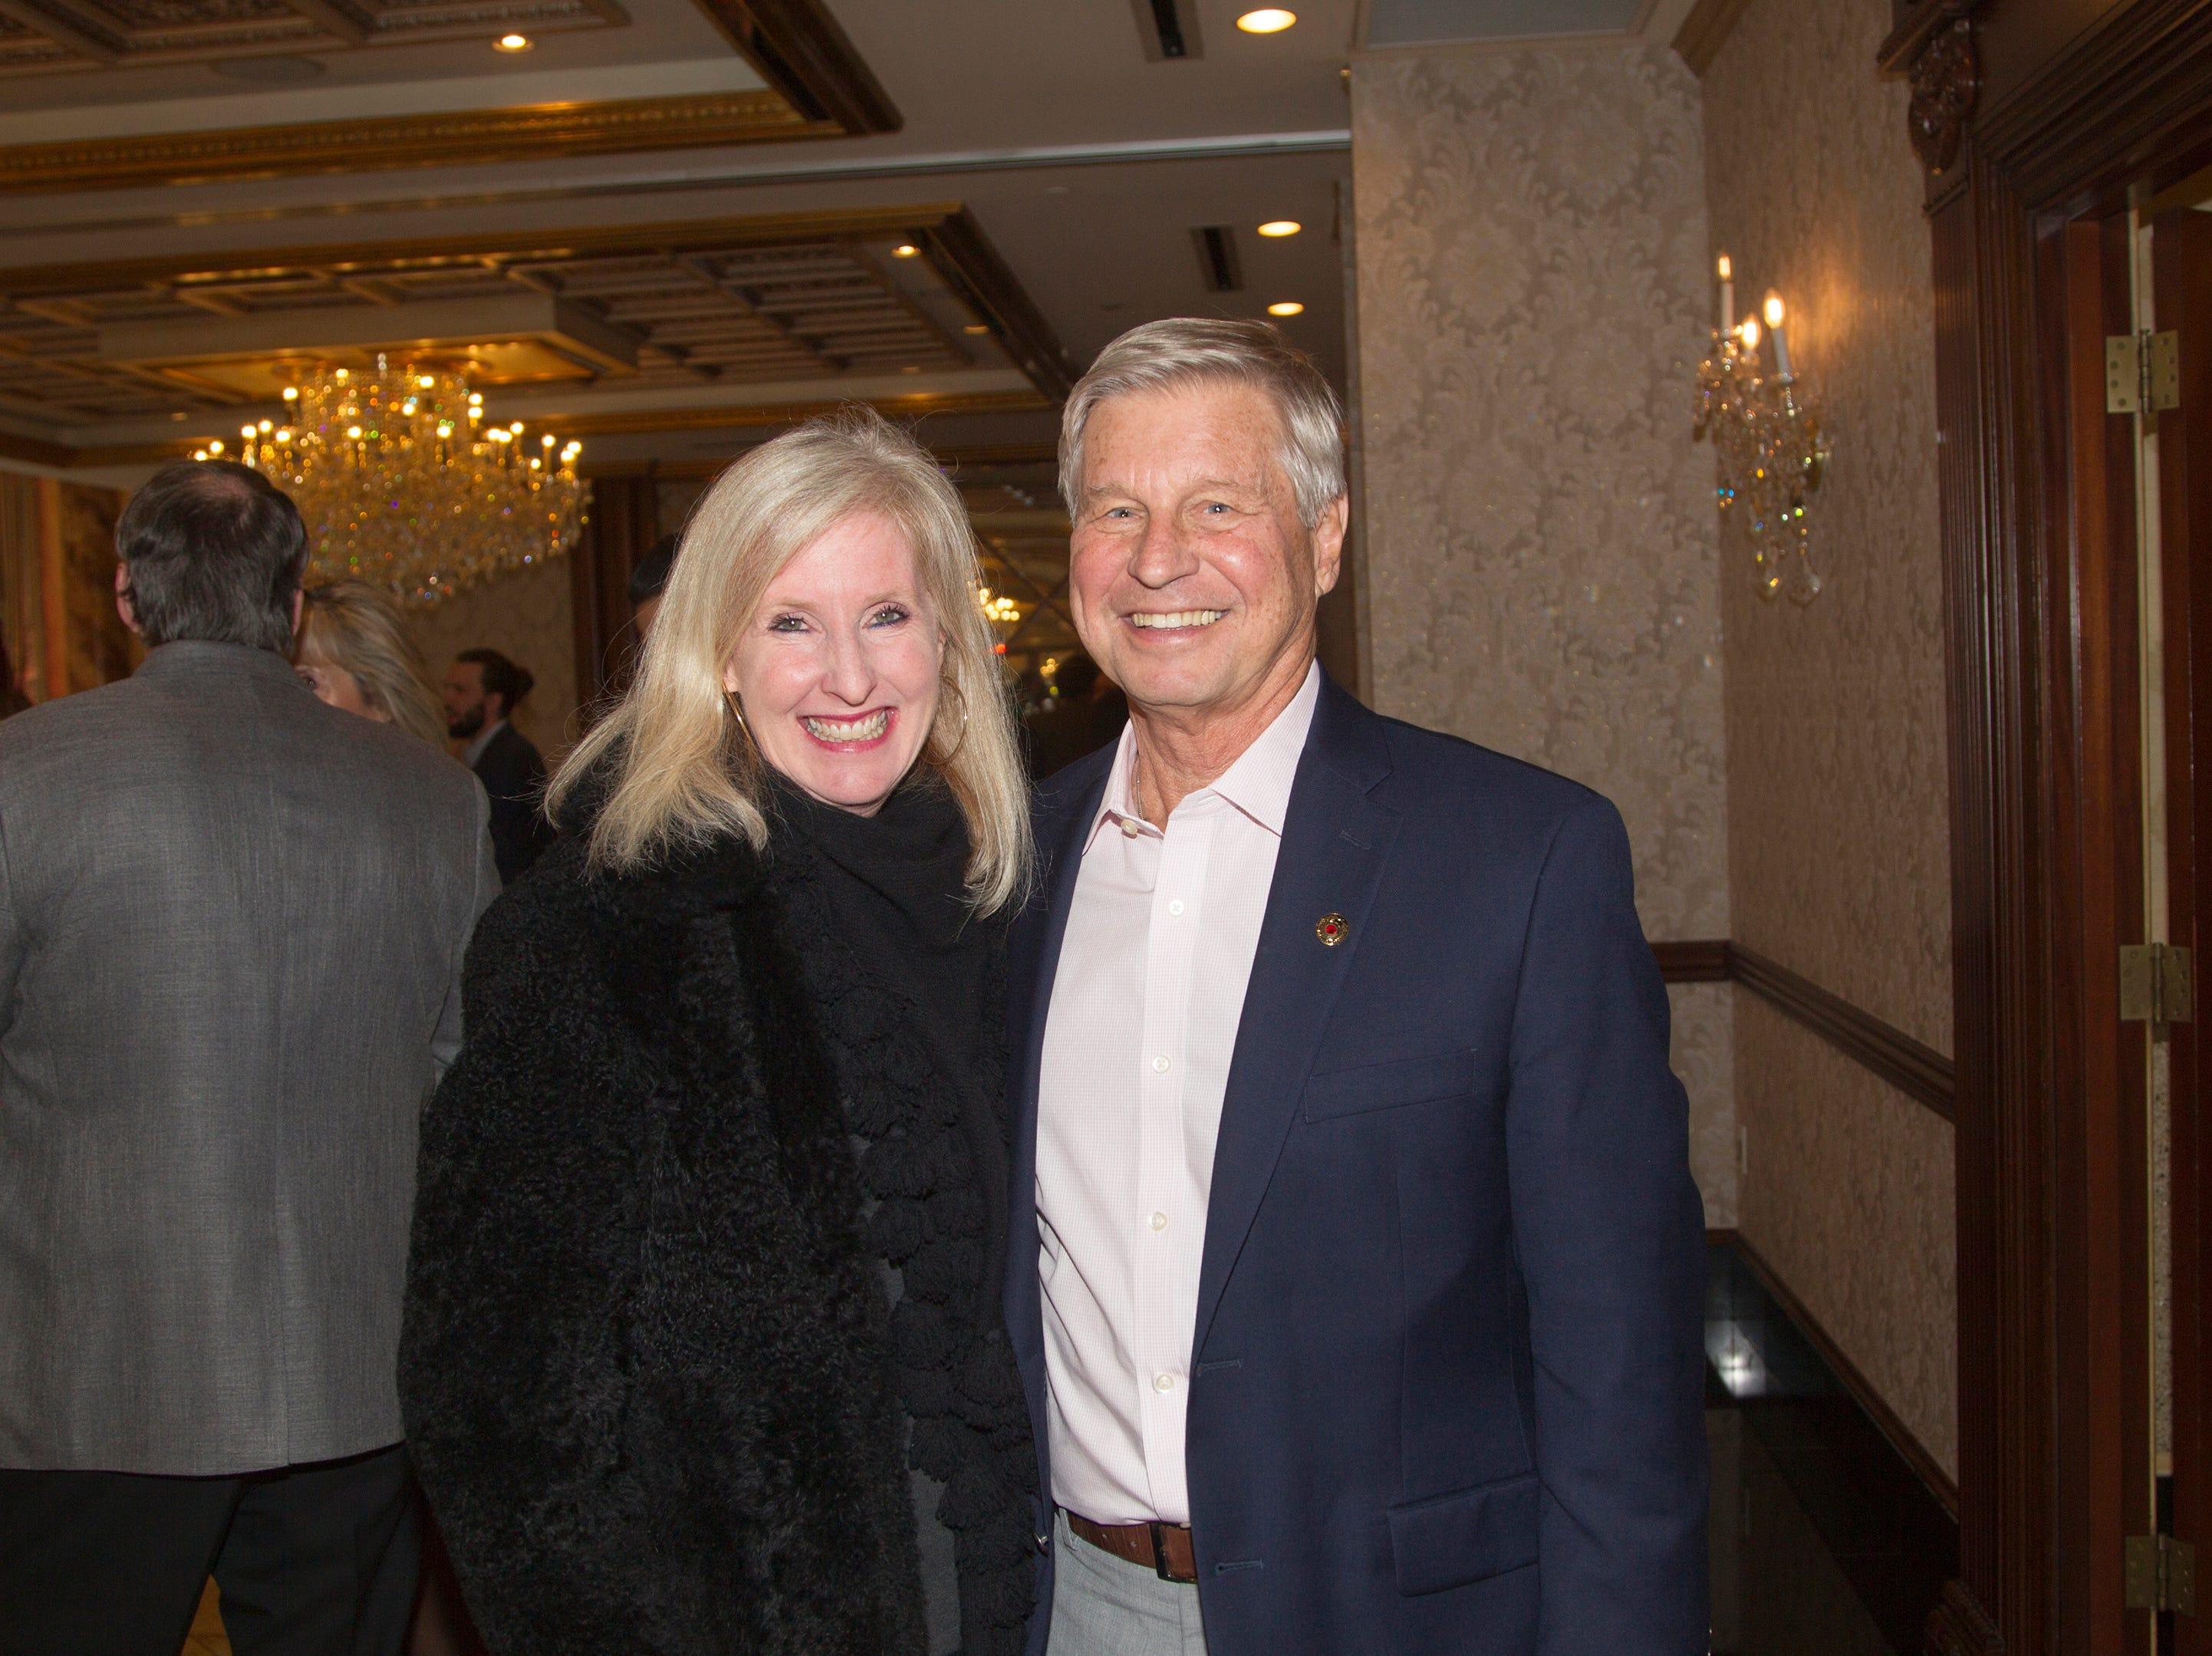 Kelly Price, Doug Sealy. Bergen Catholic High School Hall of Fame Dinner at Seasons in Washington Twp. 03/31/2019